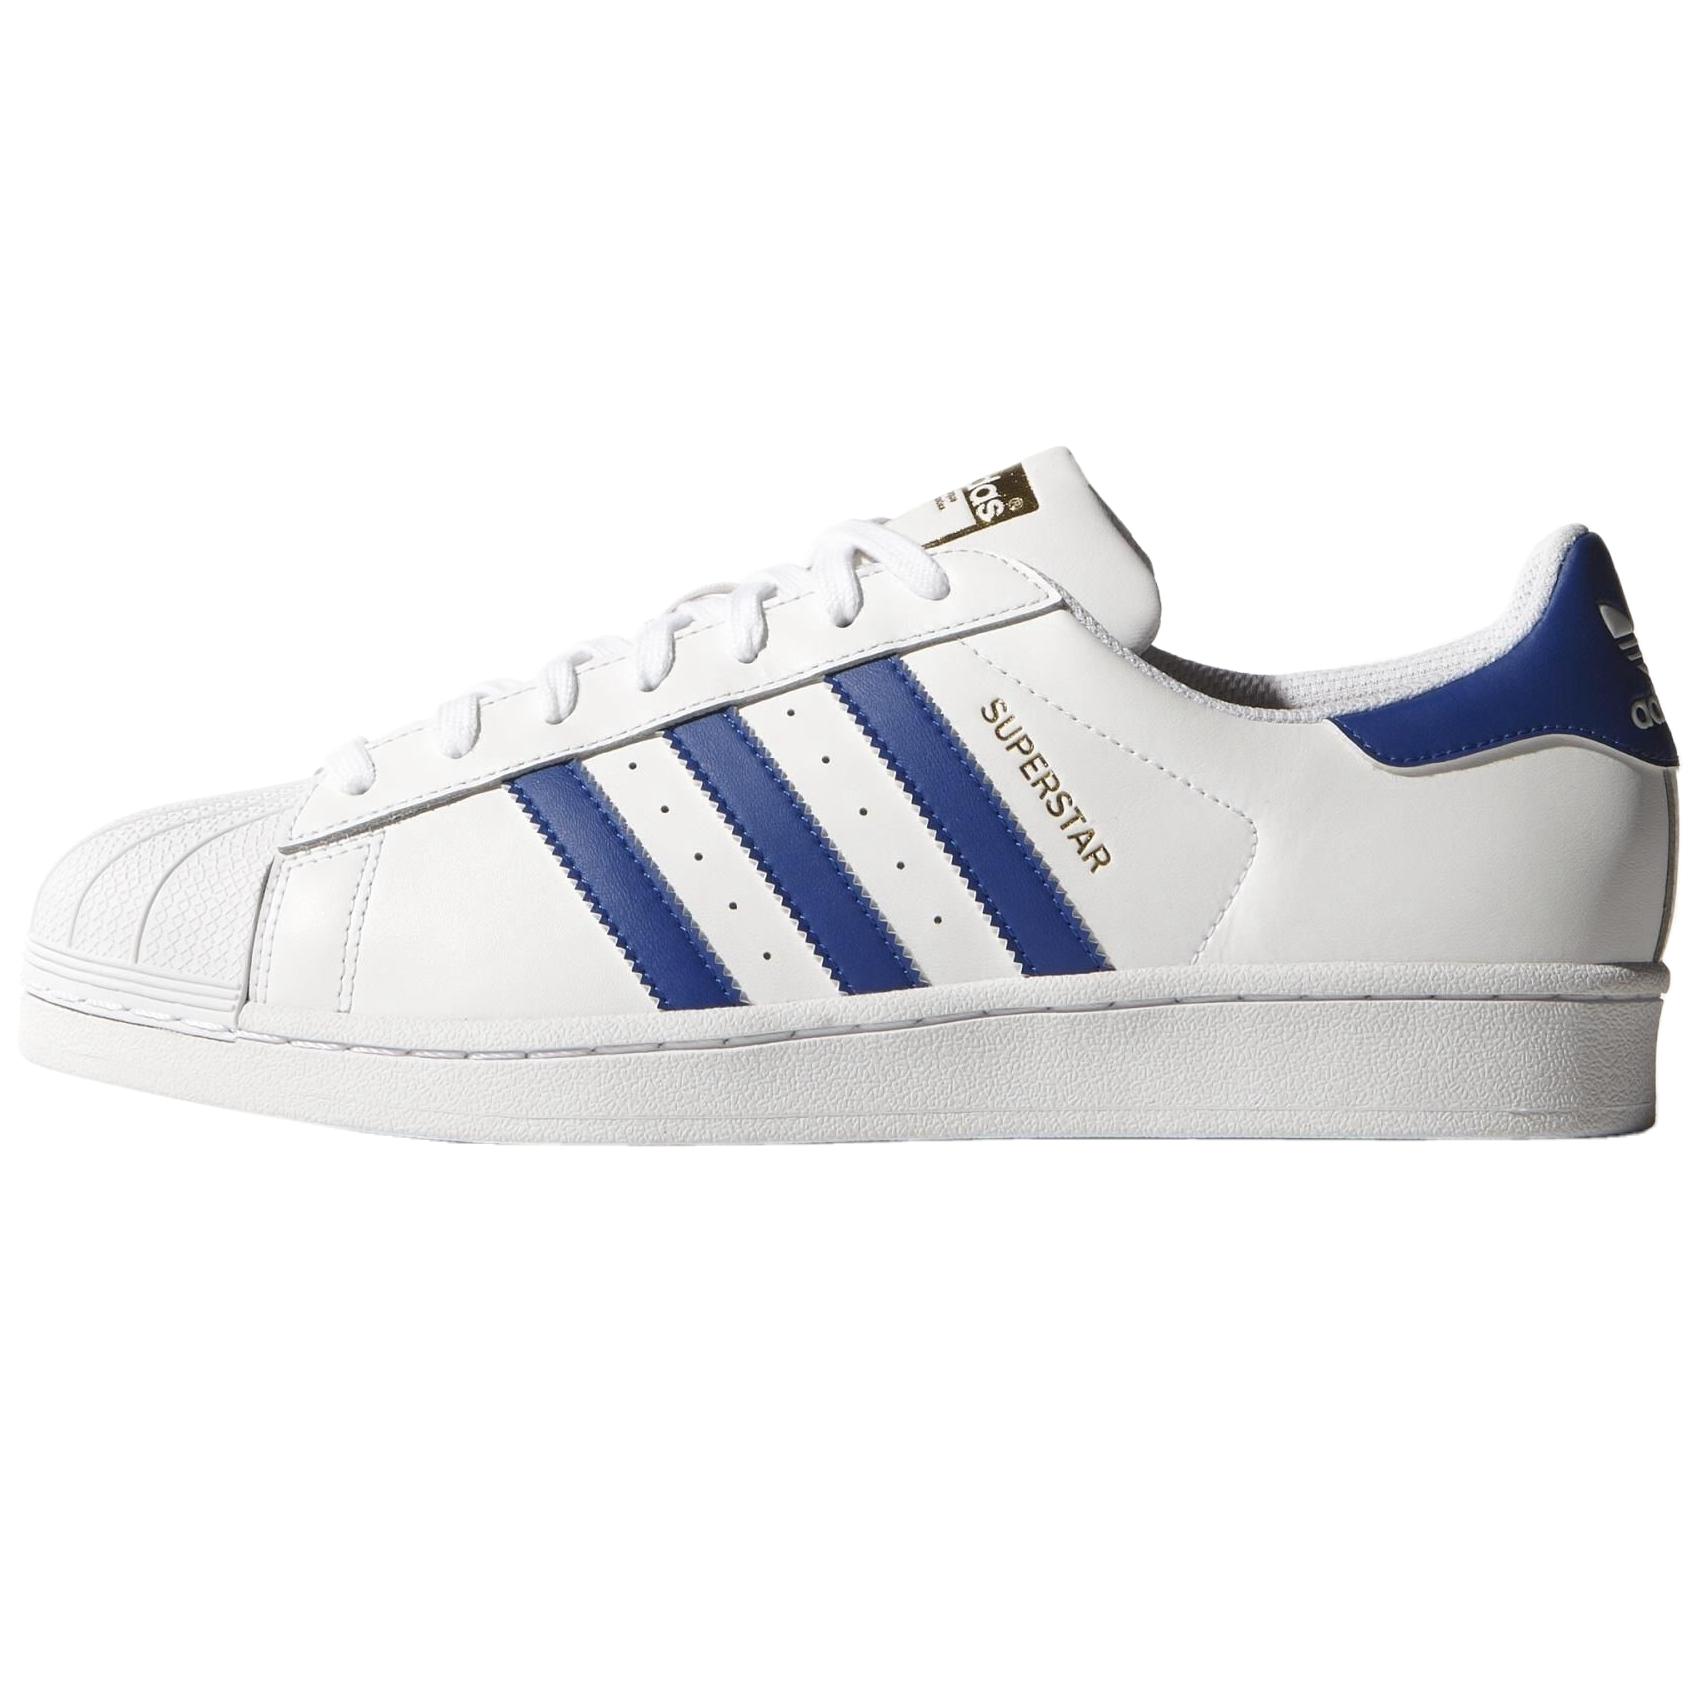 adidas originals superstar ii mens trainers shoes ebay. Black Bedroom Furniture Sets. Home Design Ideas